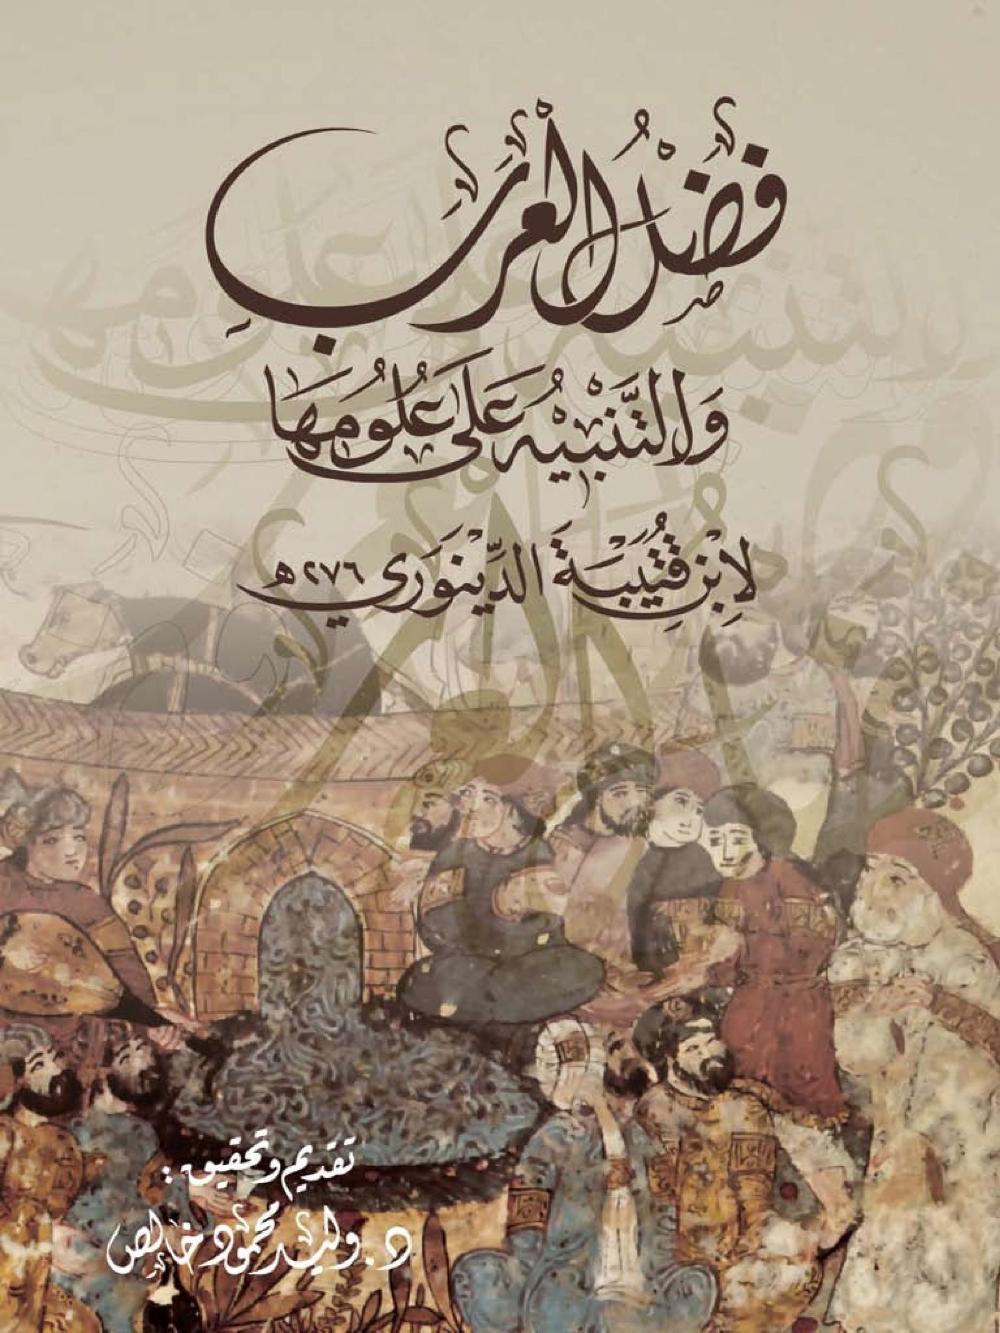 Pin By عبد الرحيم محمد On تطوير In 2020 Ebooks Free Books Arabic Books Free Books Download